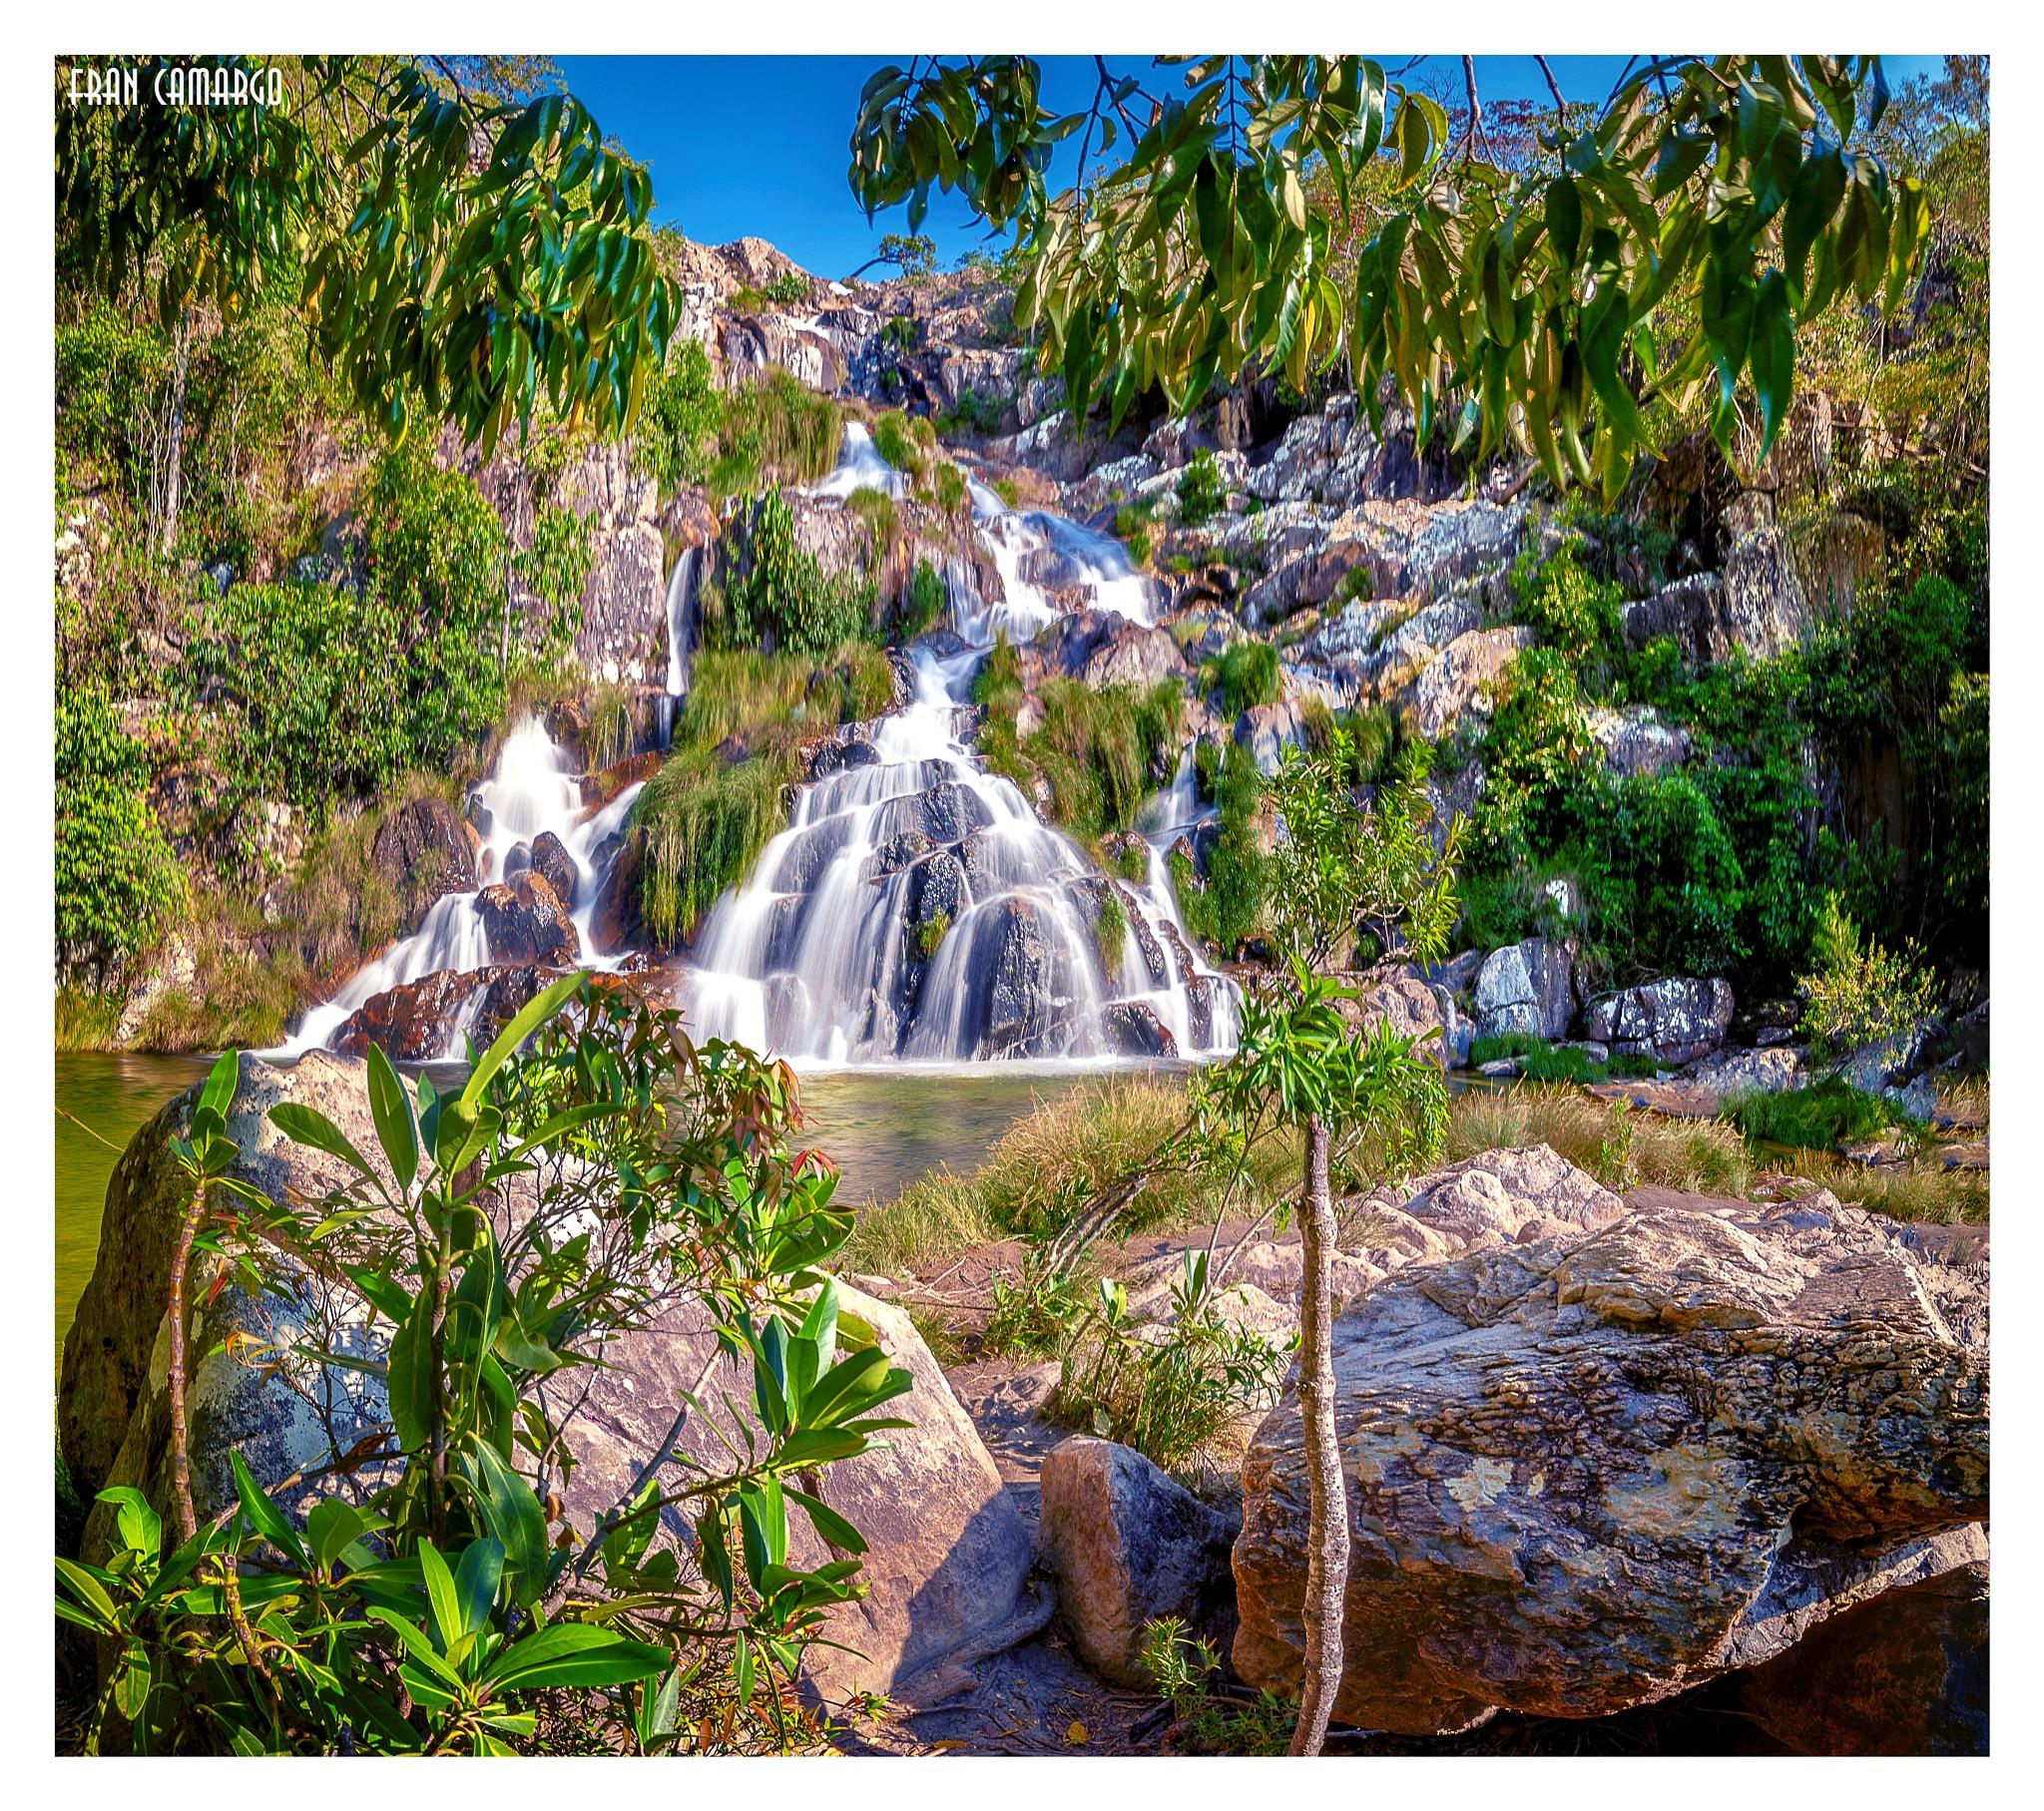 Chapada dos Veadeiros National Park - State of Goiás - Brazil by Fran Camargo